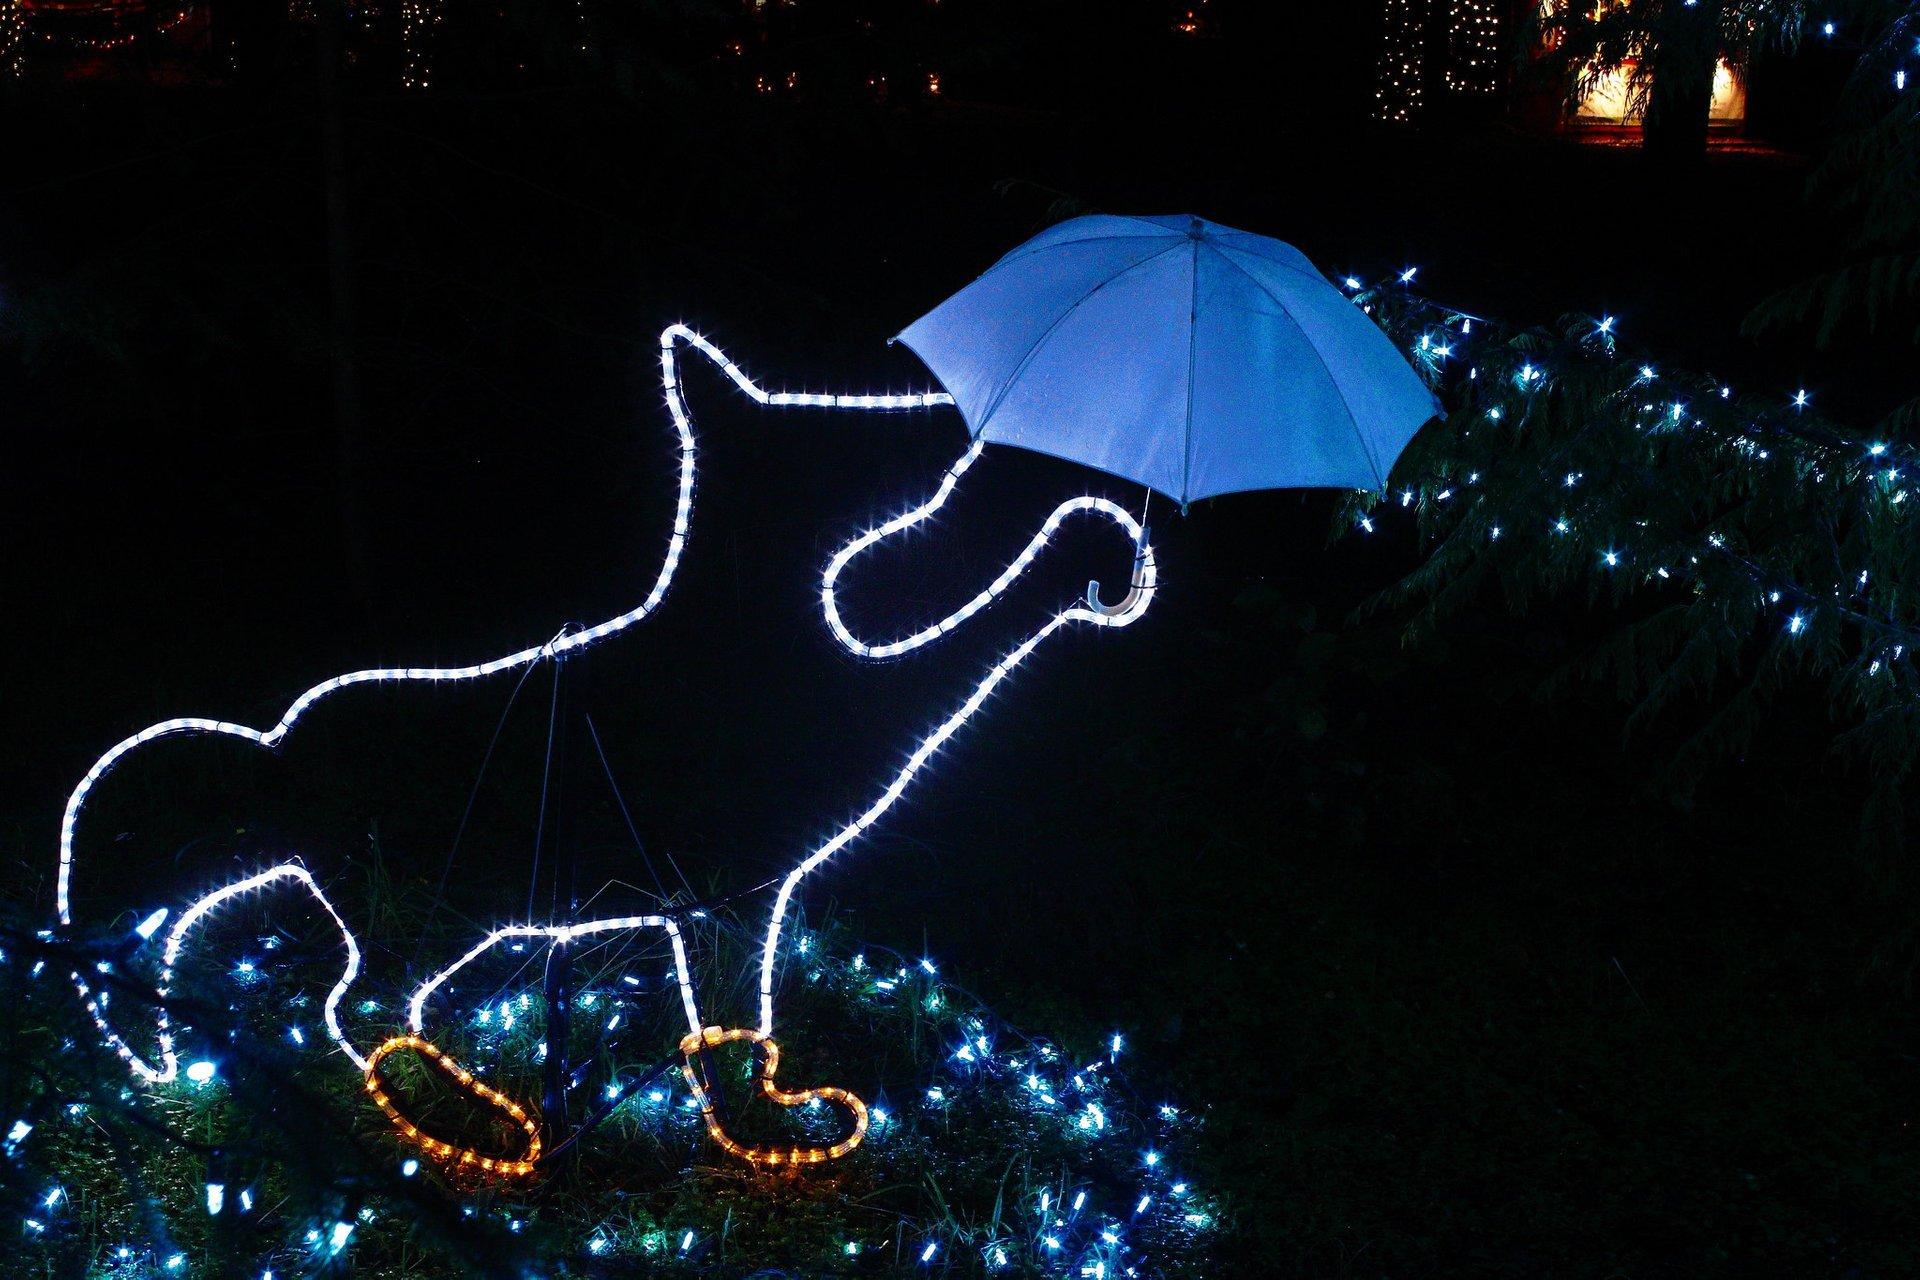 Oregon's Christmas Light Displays 2020-2021 in Oregon - Best Season 2020